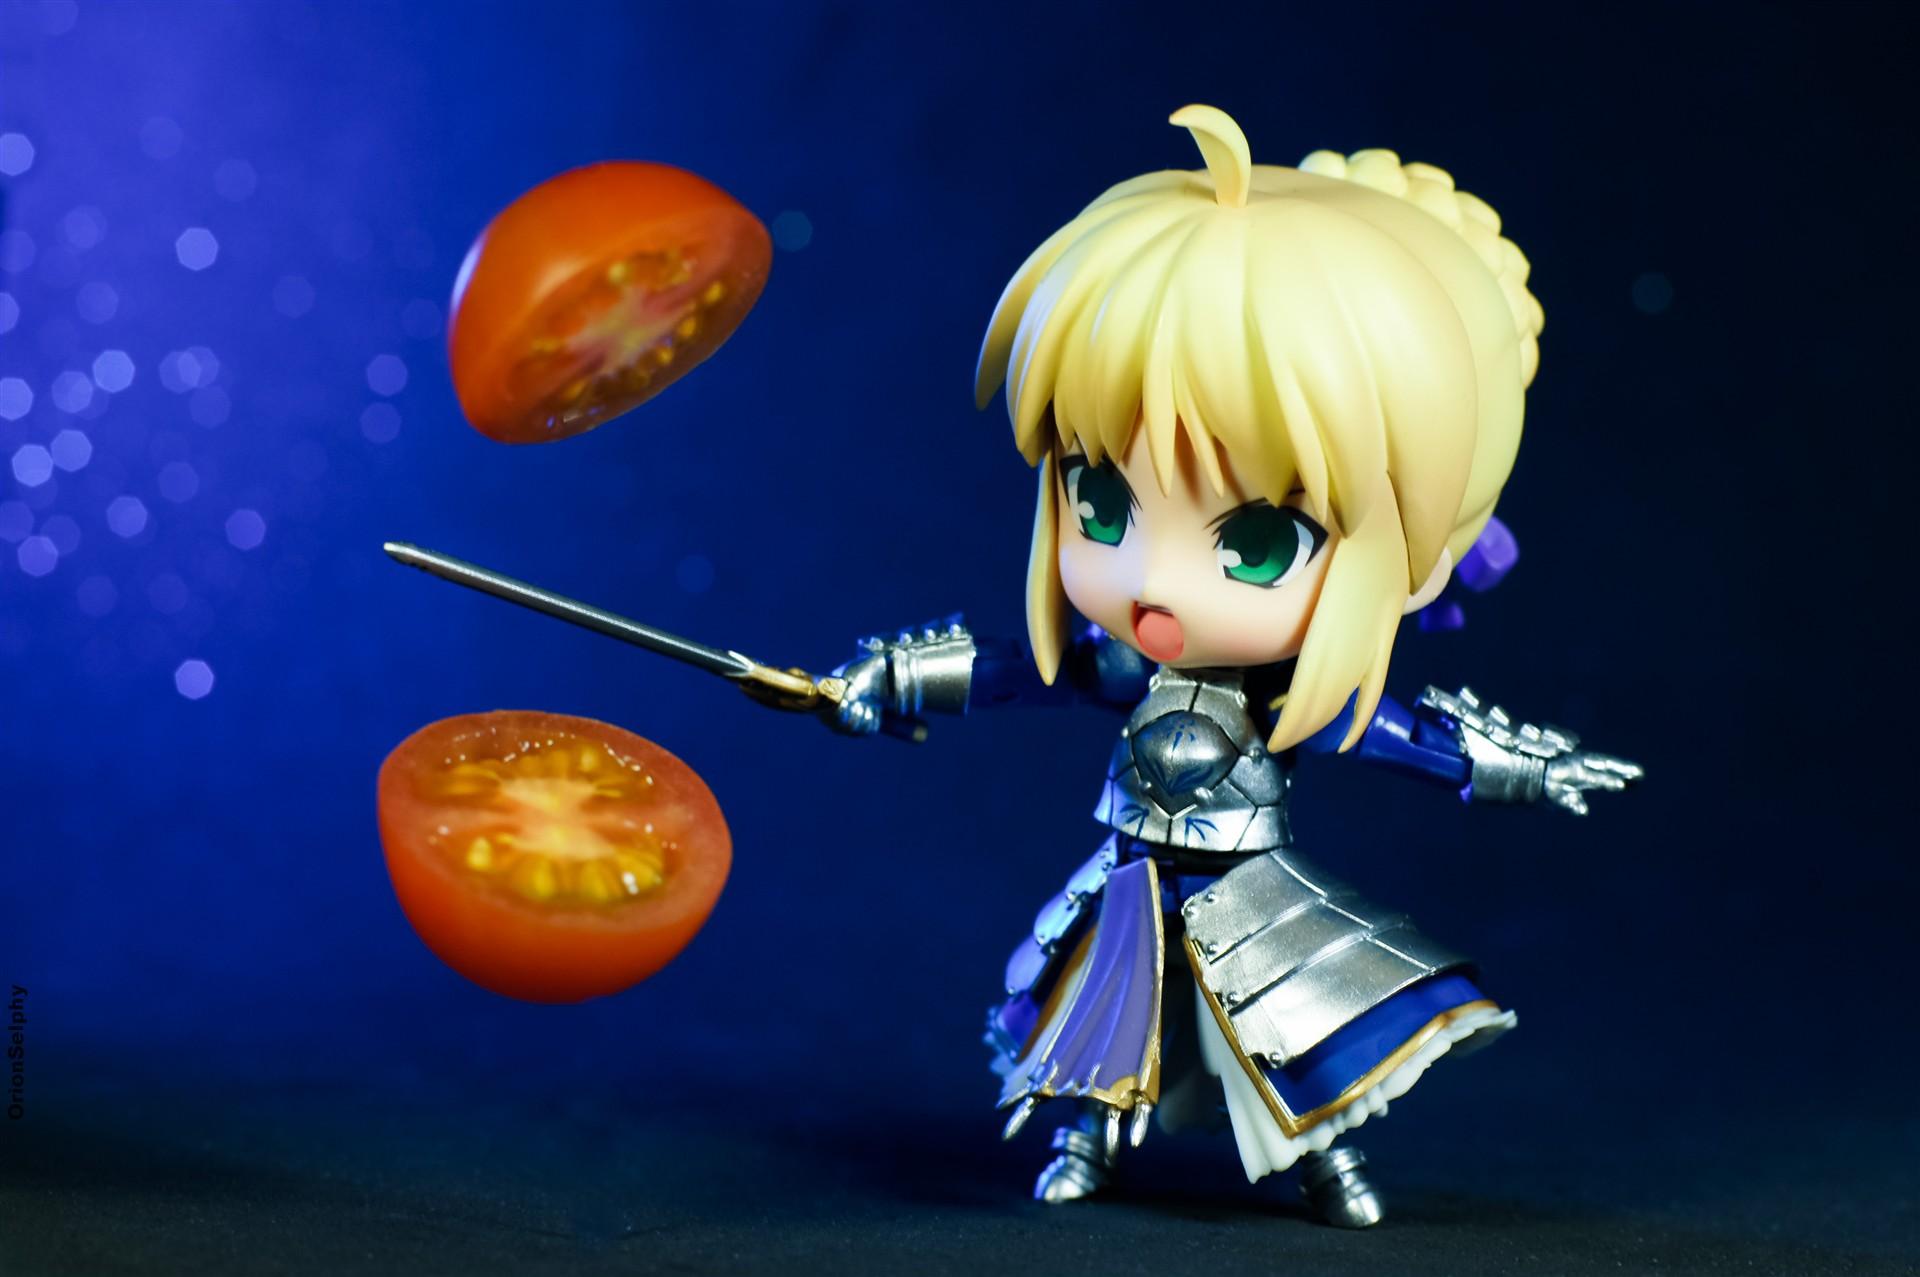 blond_hair super nendoroid sword movable saber night stay bokeh jfigure excaliburb tomato cut slash